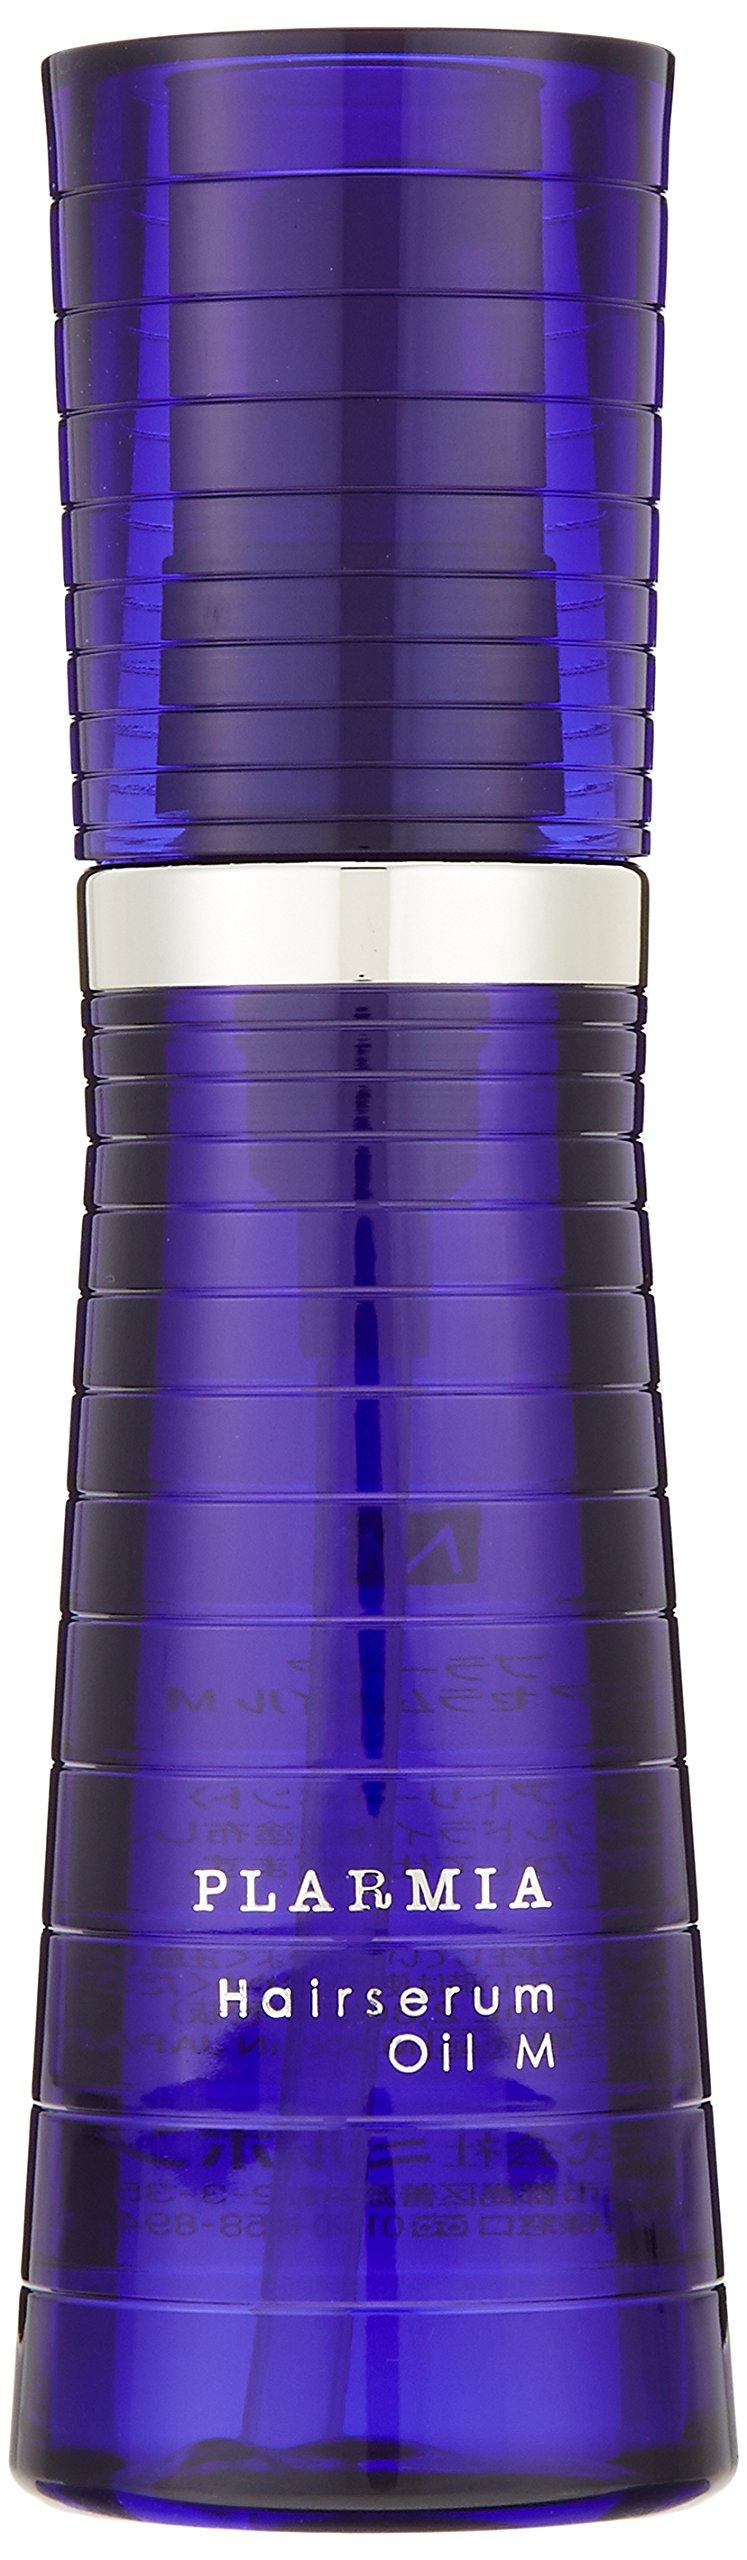 Plarmia Hairserum Oil M-4.1oz